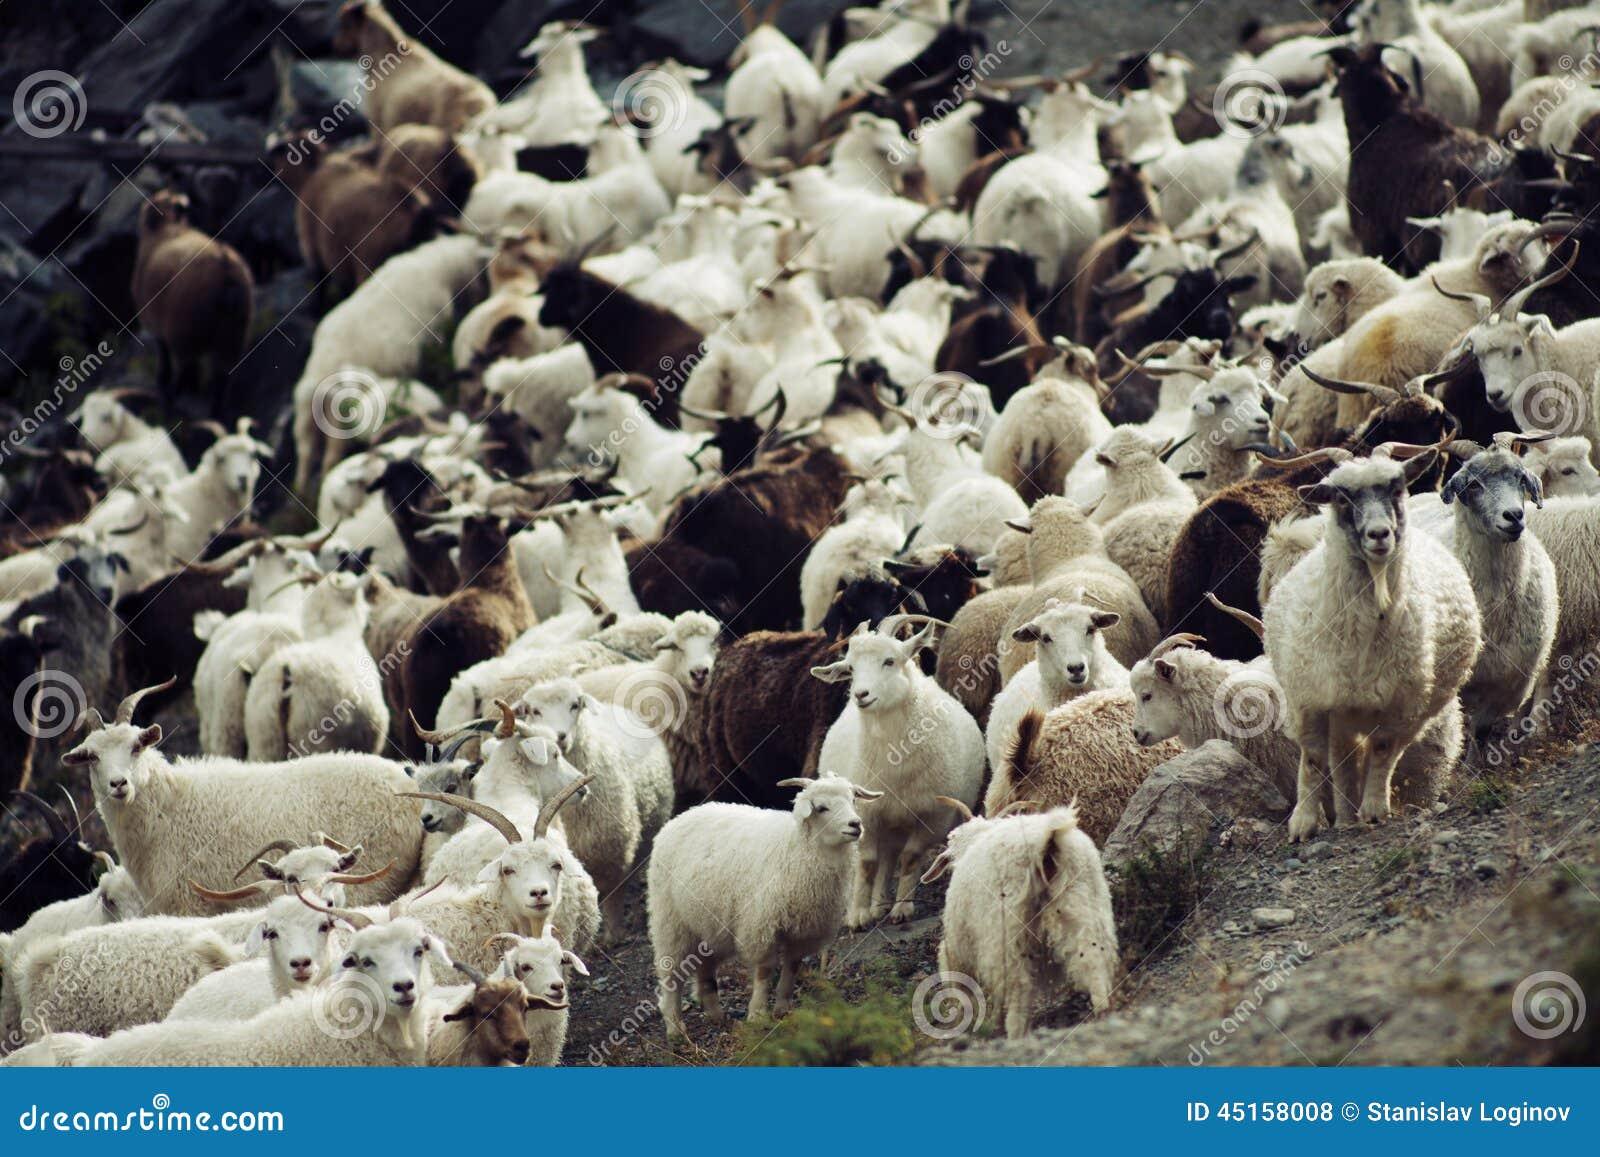 goat herd stock photo image of goat herd sheep portrait 45158008